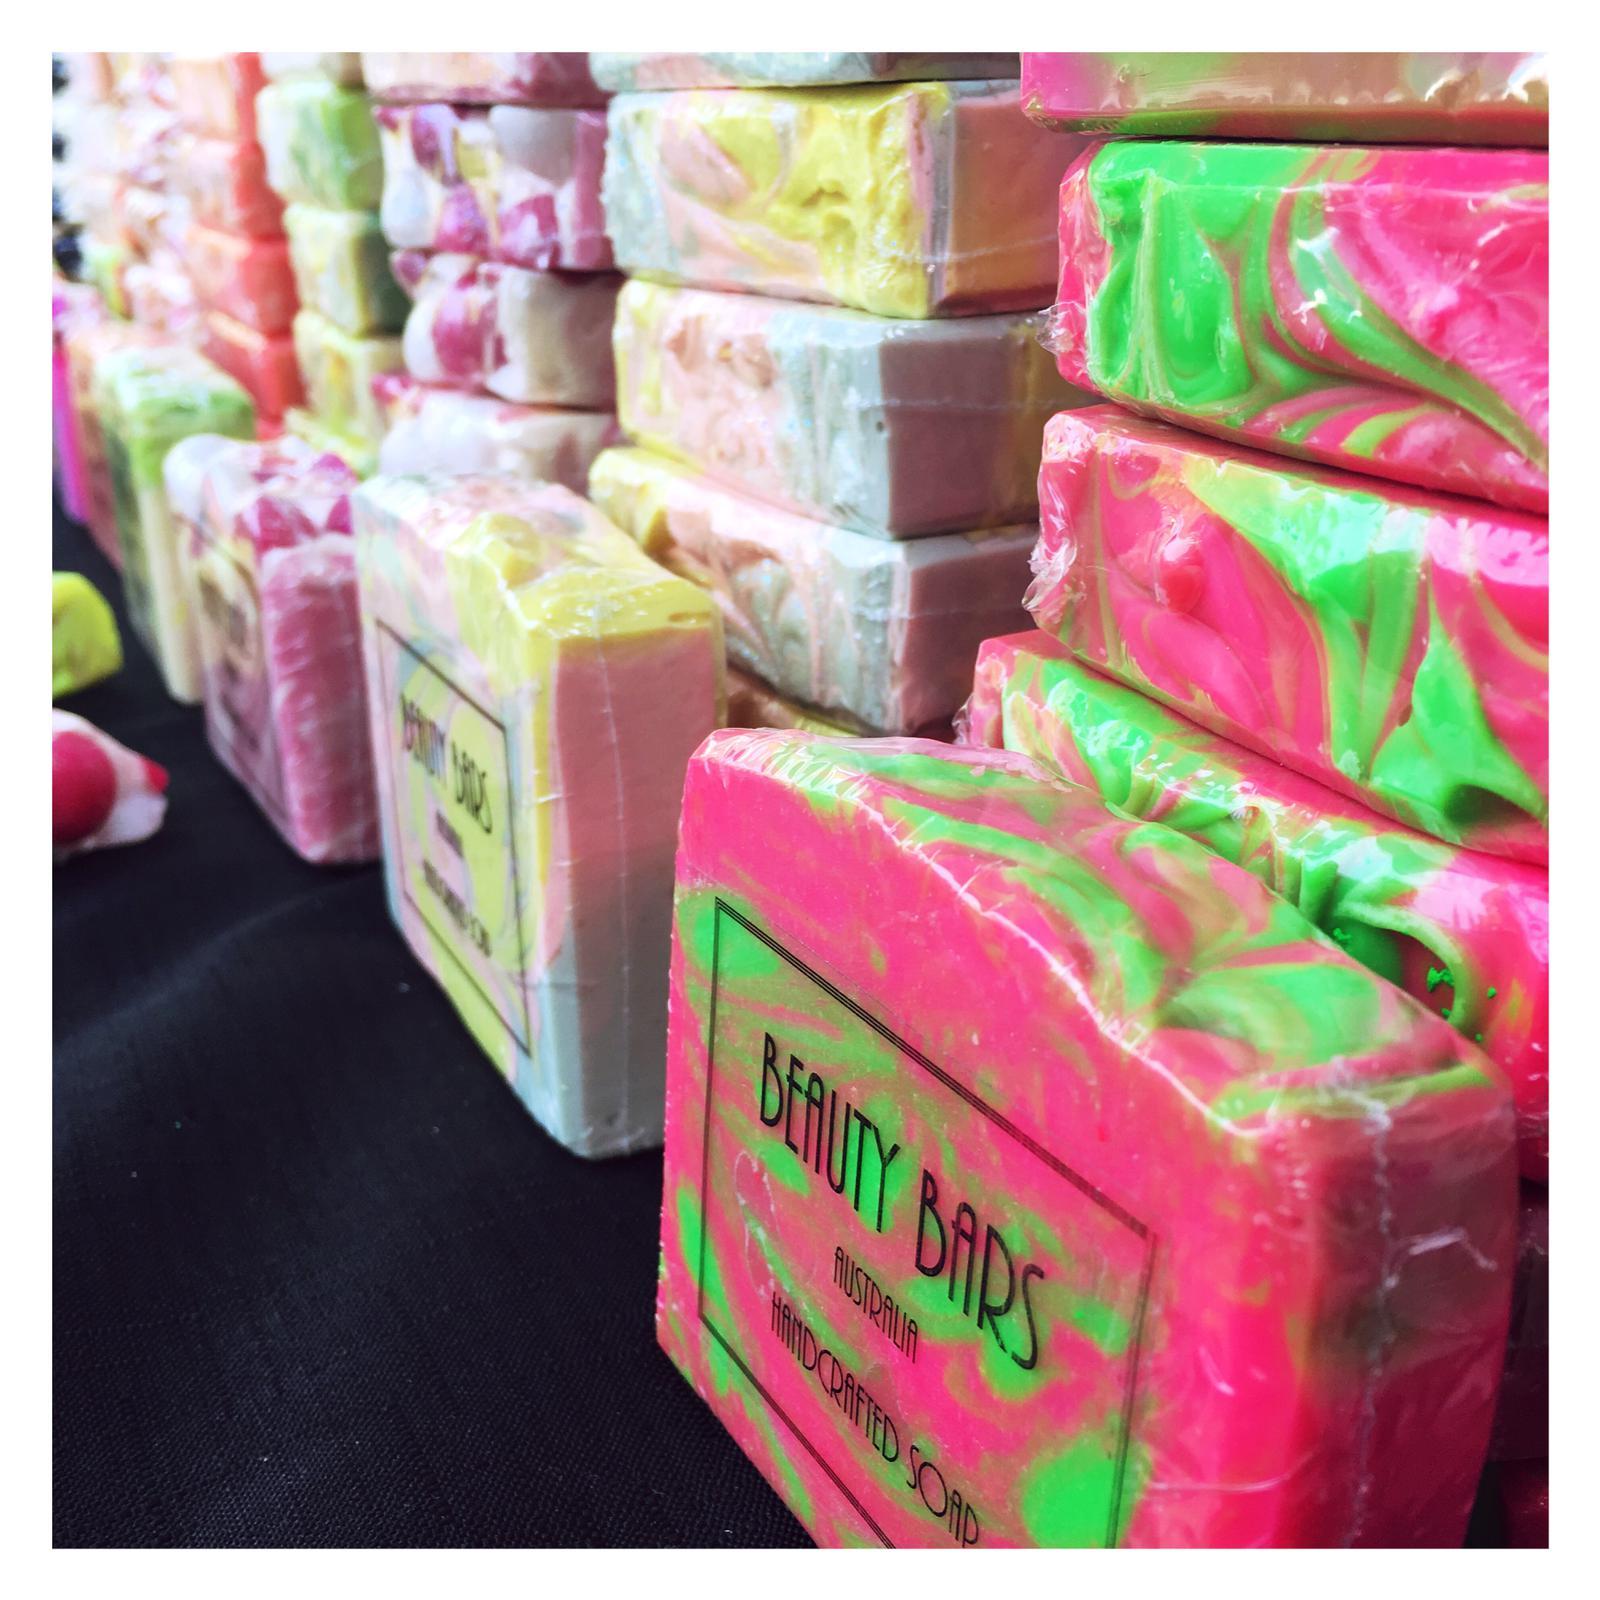 Market Day Soap Stacks